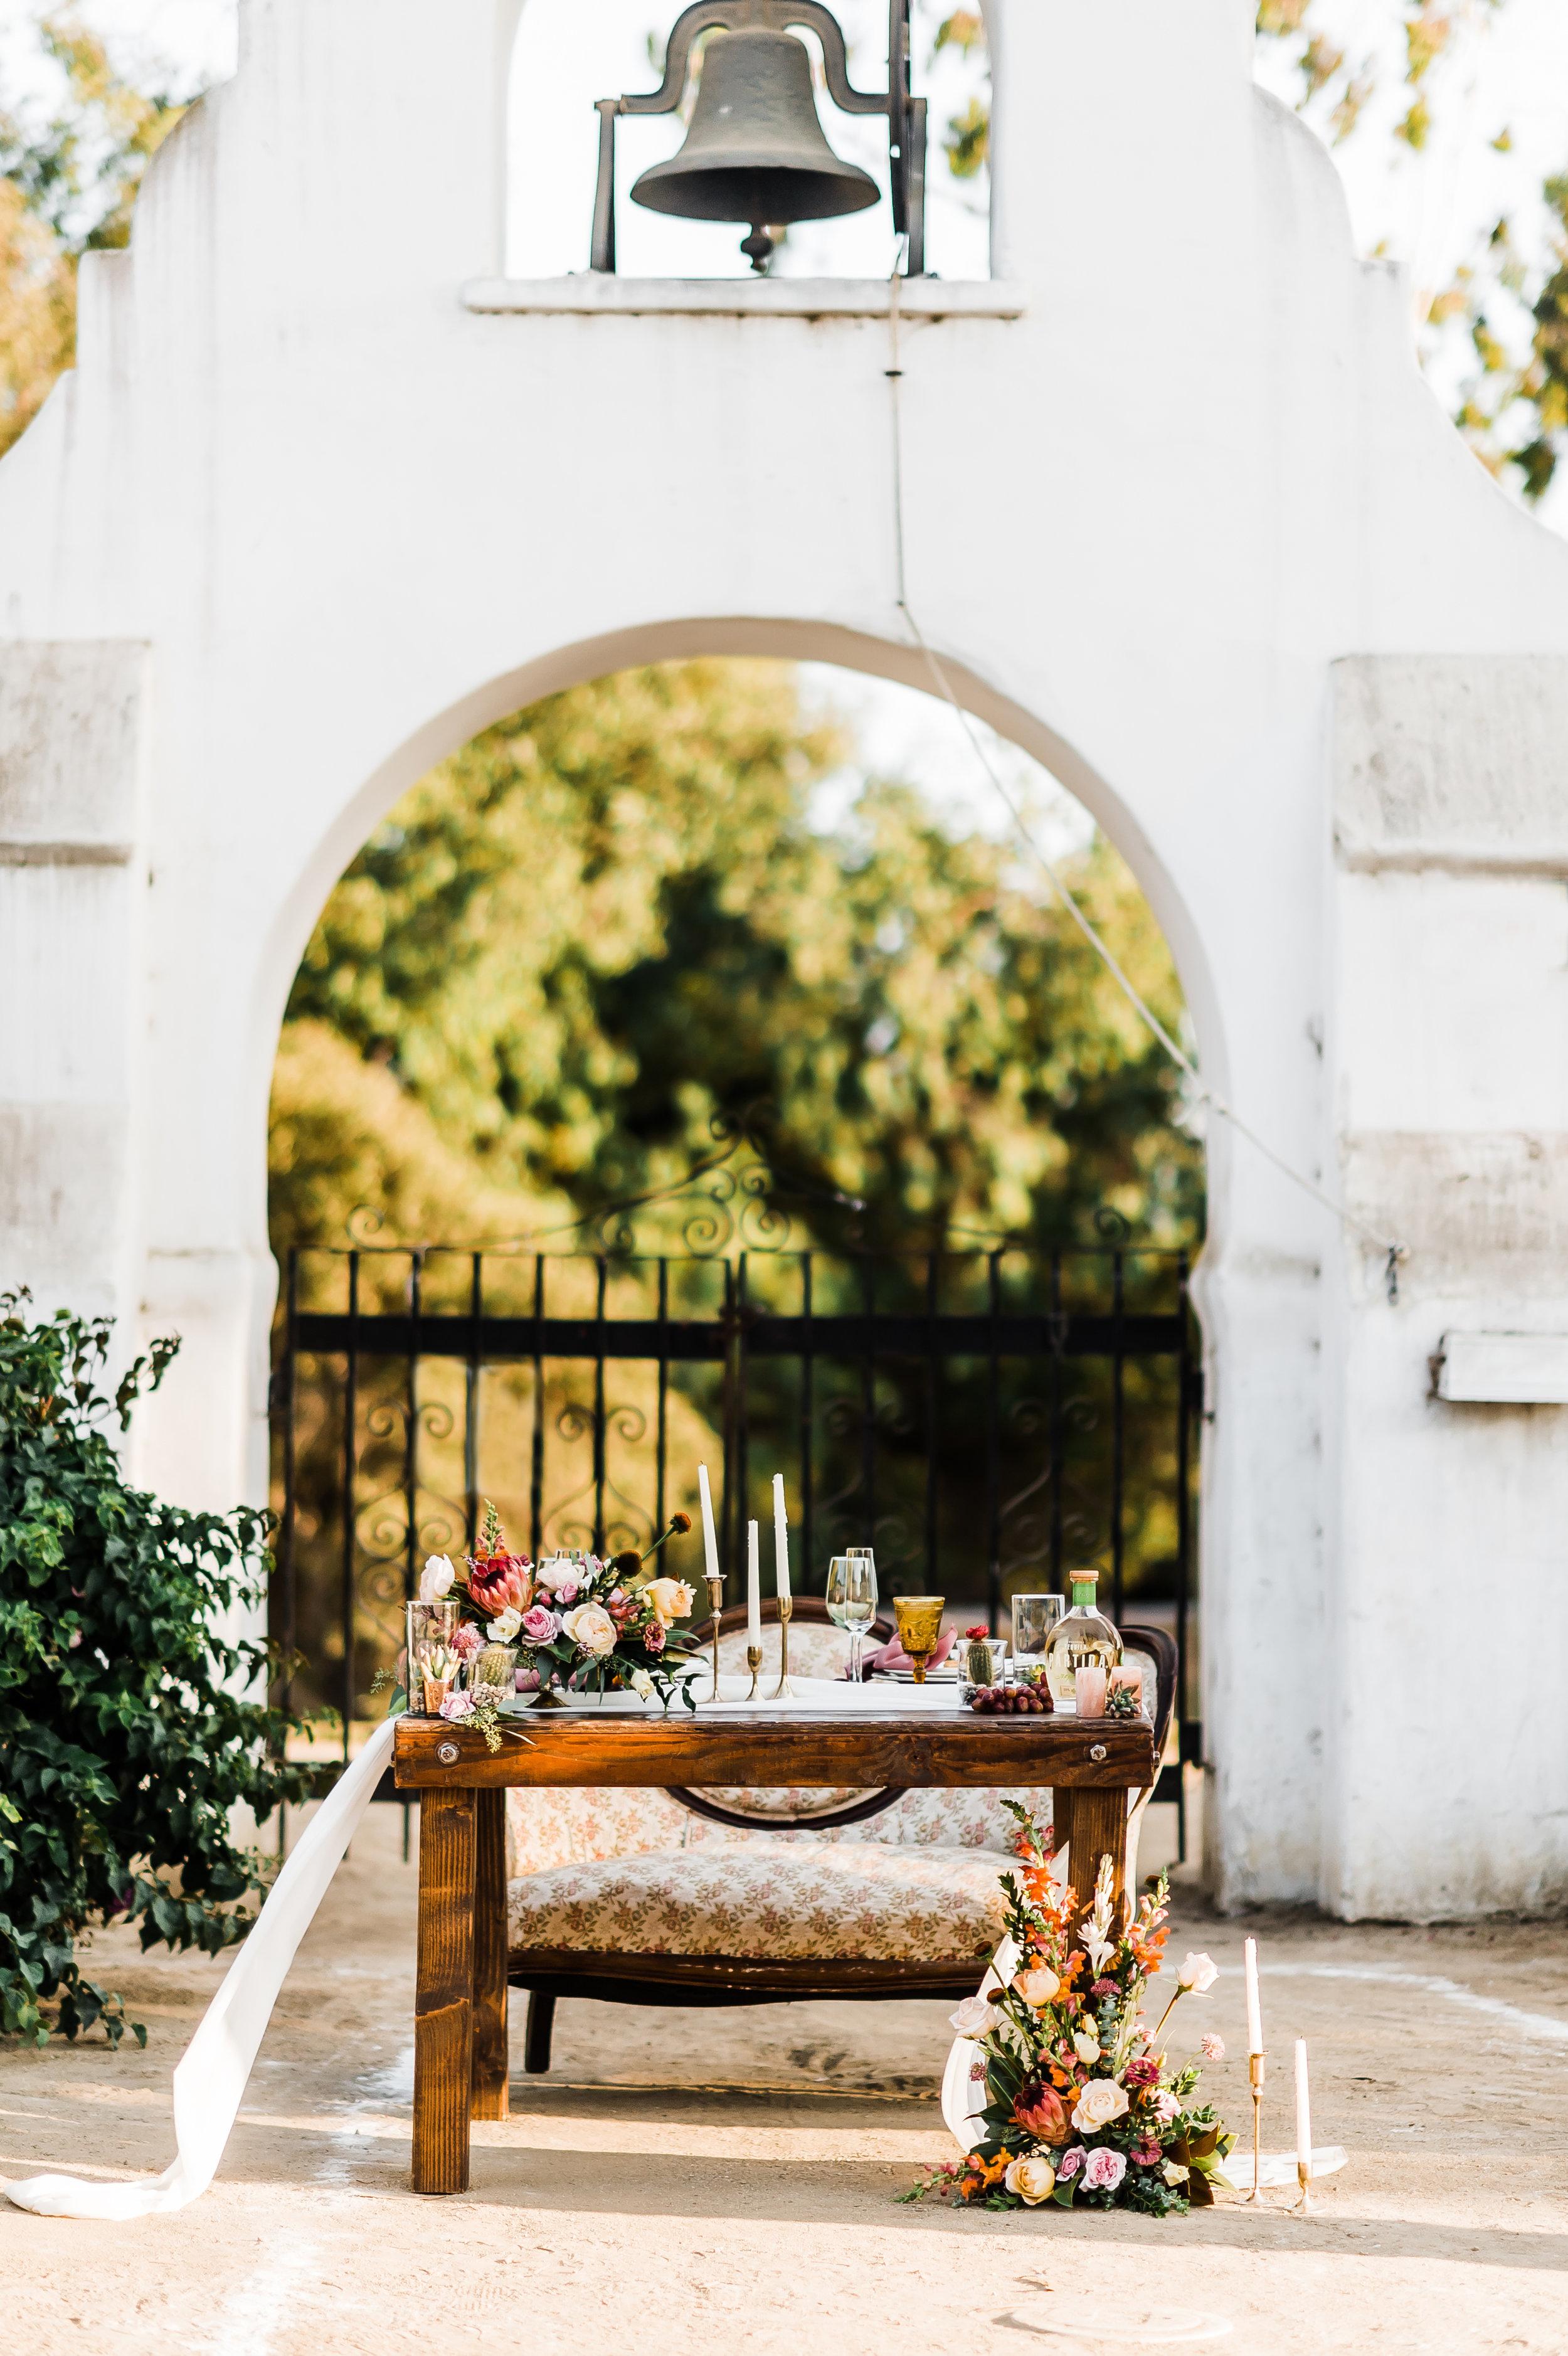 www.santabarbarawedding.com | Michelle Ramirez Photography | Olivas Adobe | Karen Marie Events | Tangled Lotus | Amigo Party Rentals | Dreams America Linens | Erickson Surfaces | Couple's Table